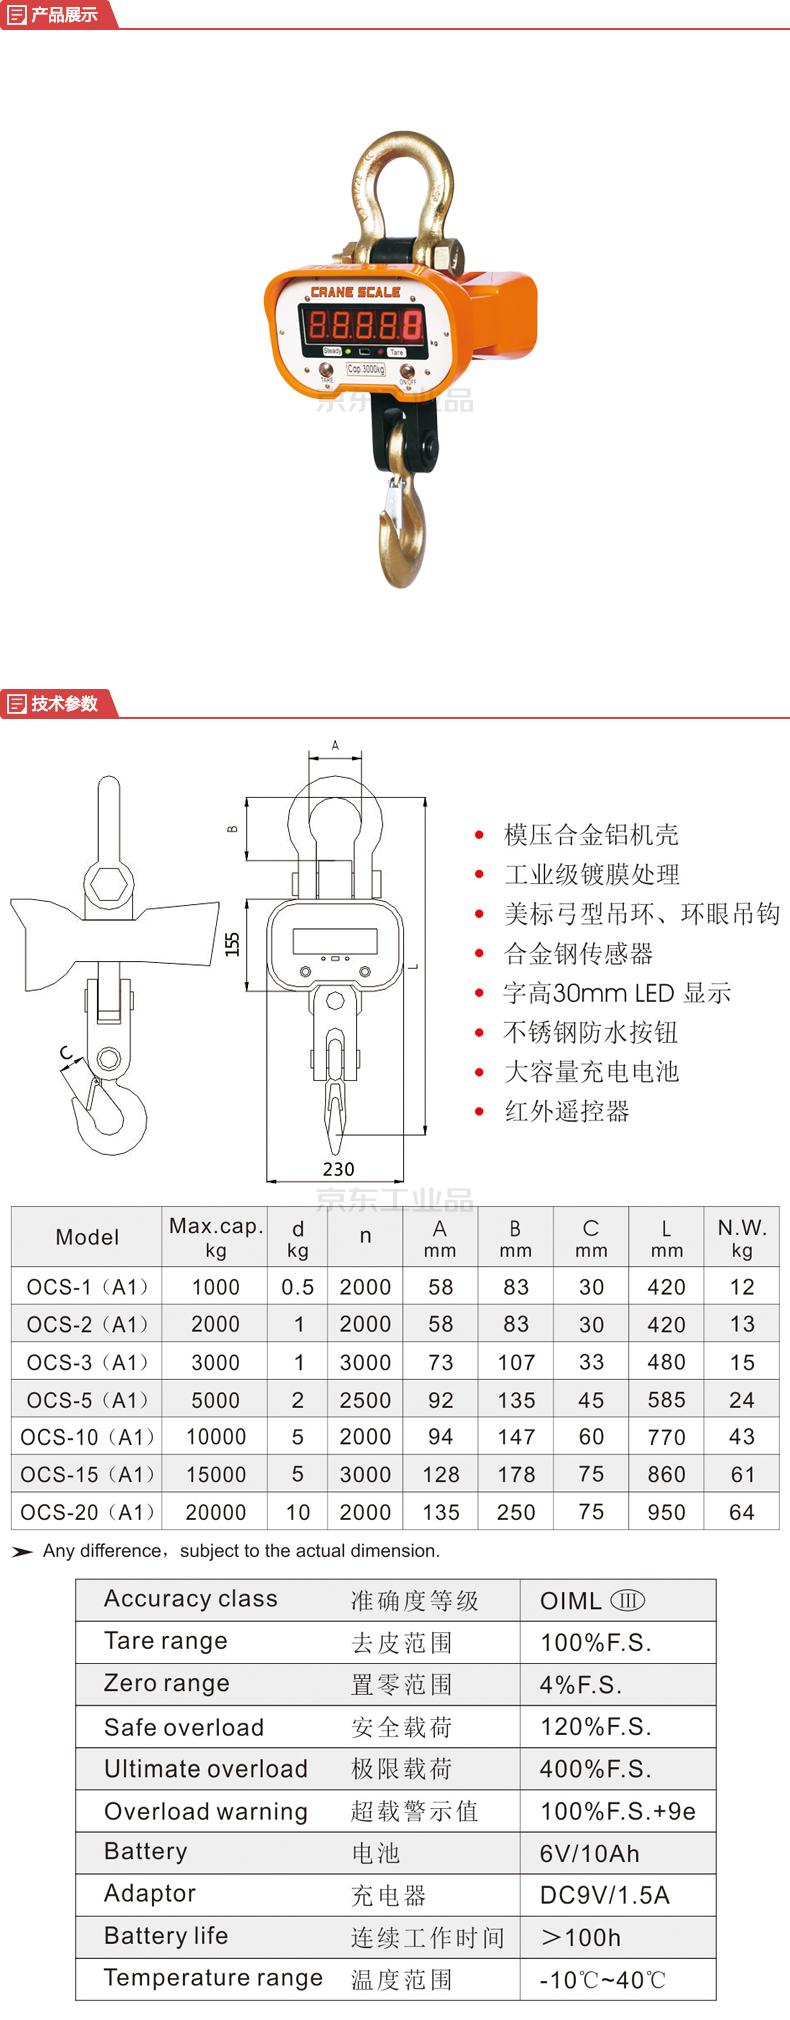 Tianchen(天辰) 直示通用型电子吊秤,最大称量1000kg,分度值0.5kg;OCS-A1-1T